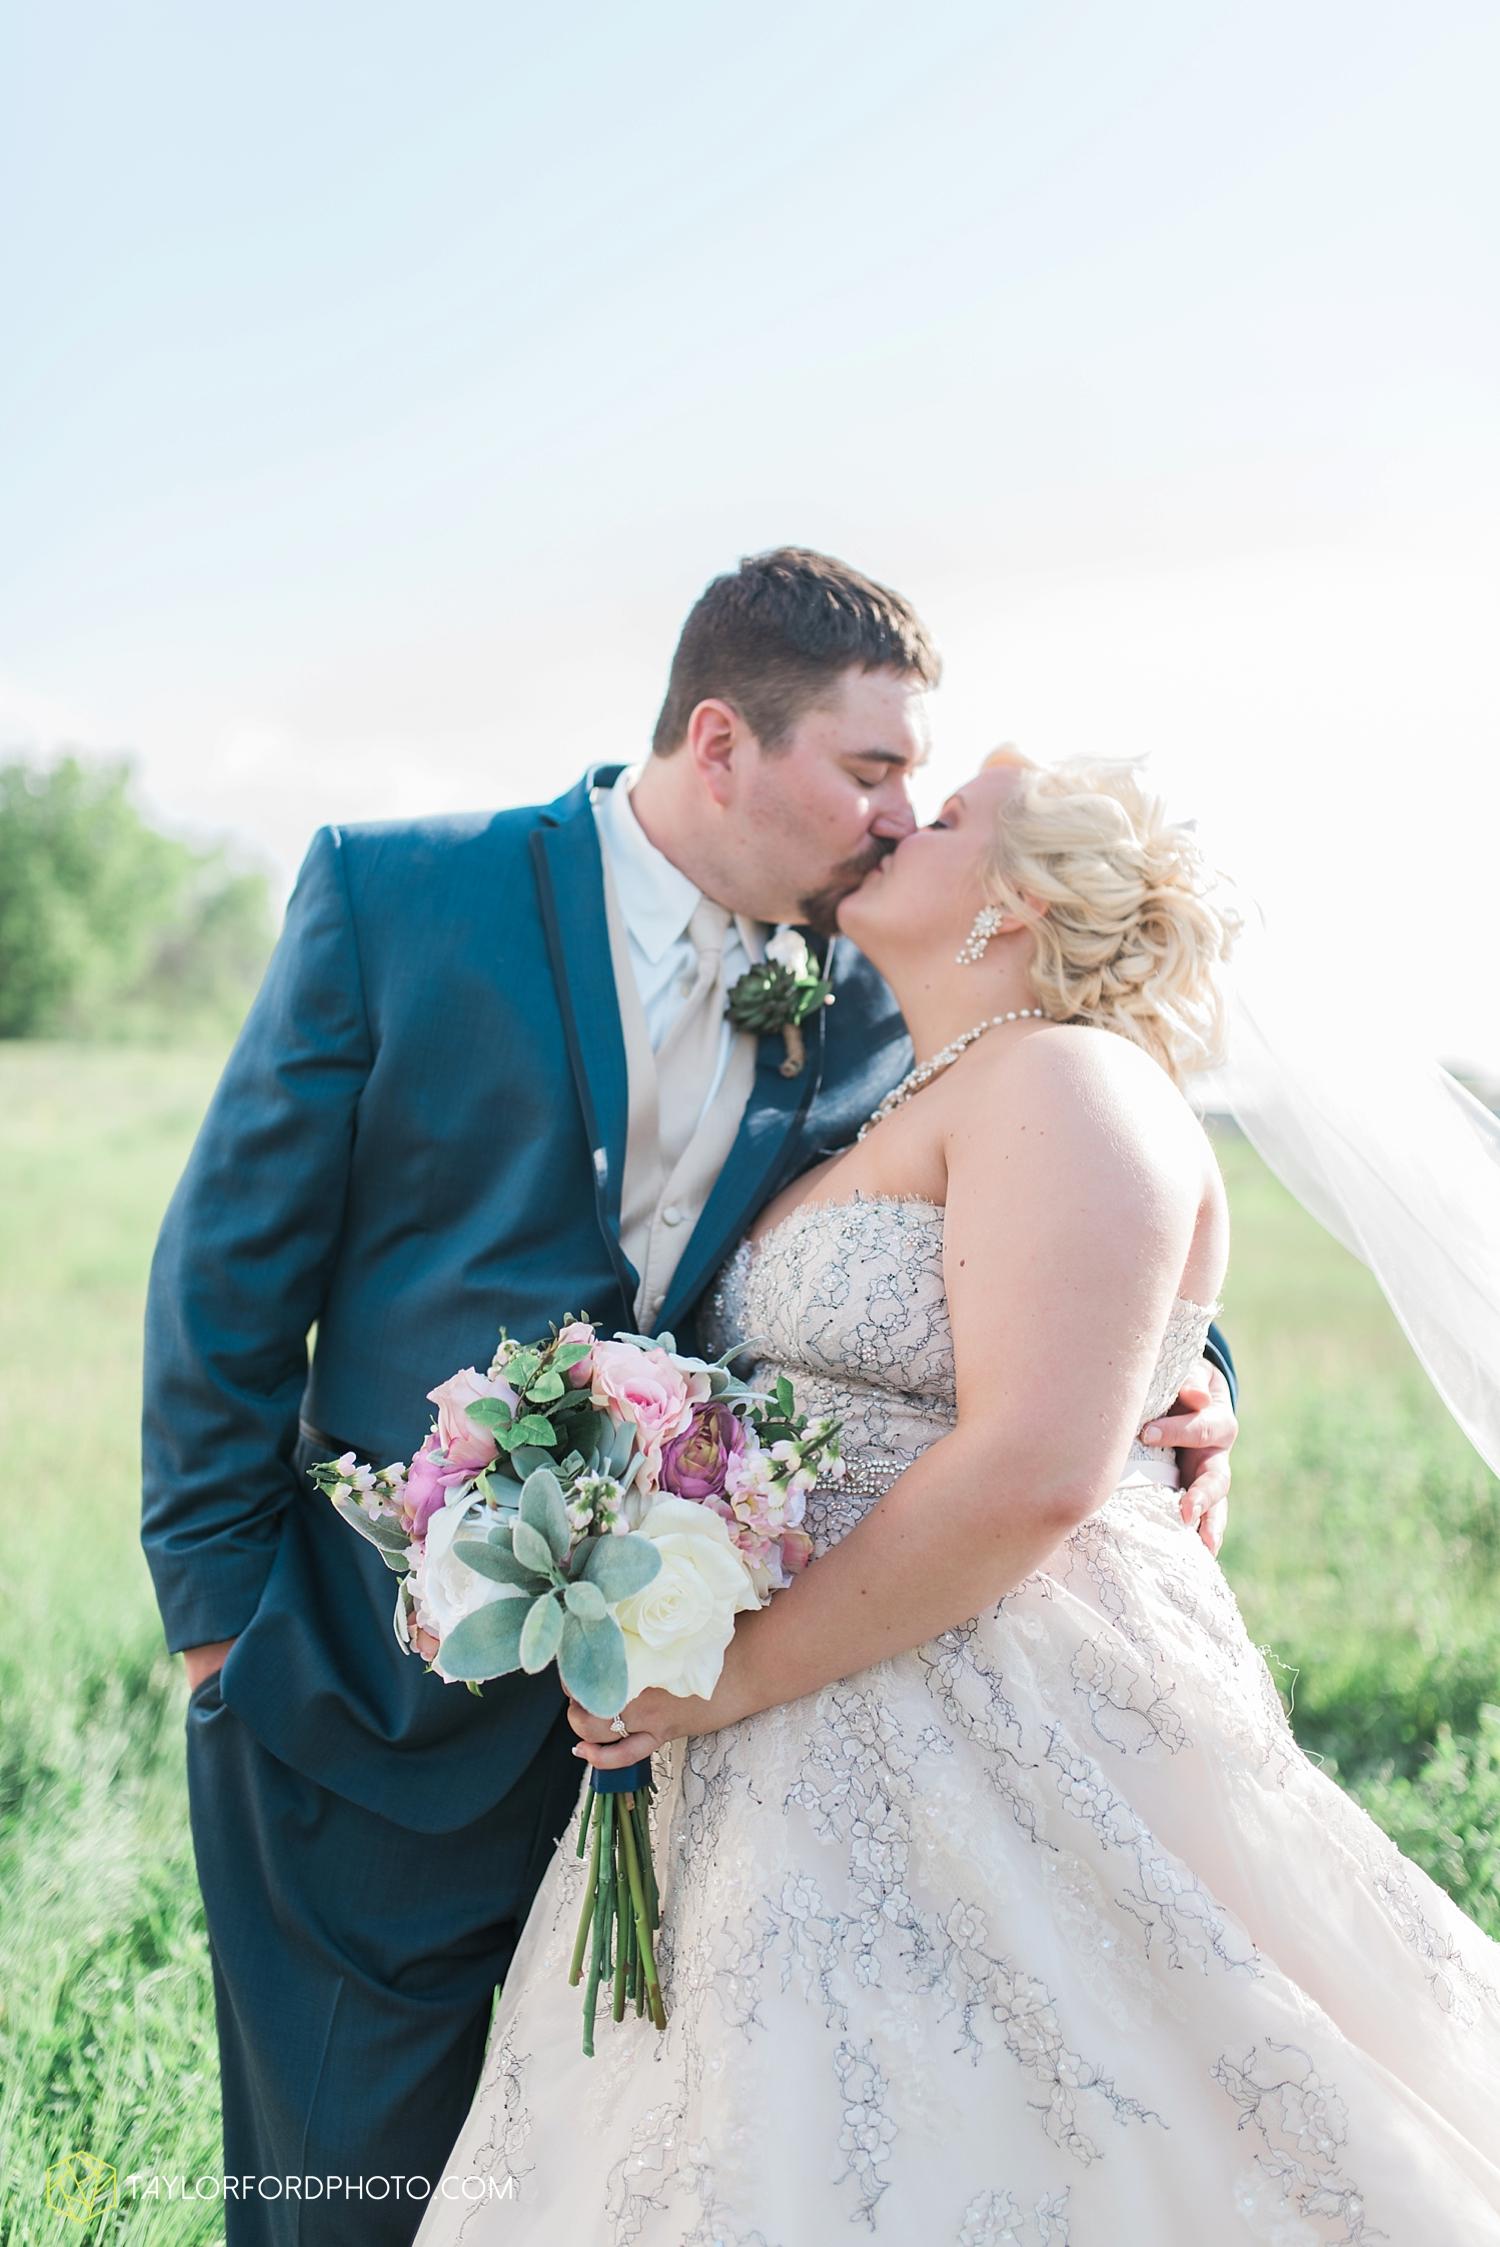 van_wert_ohio_wedding_photographer_taylor_ford_1293.jpg